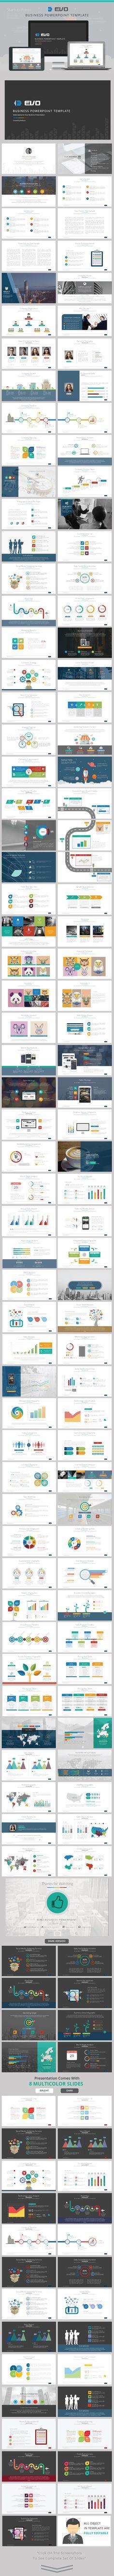 Evo Powerpoint Design Tempalte #slides Download: http://graphicriver.net/item/evo-powerpoint-template/12936737?ref=ksioks